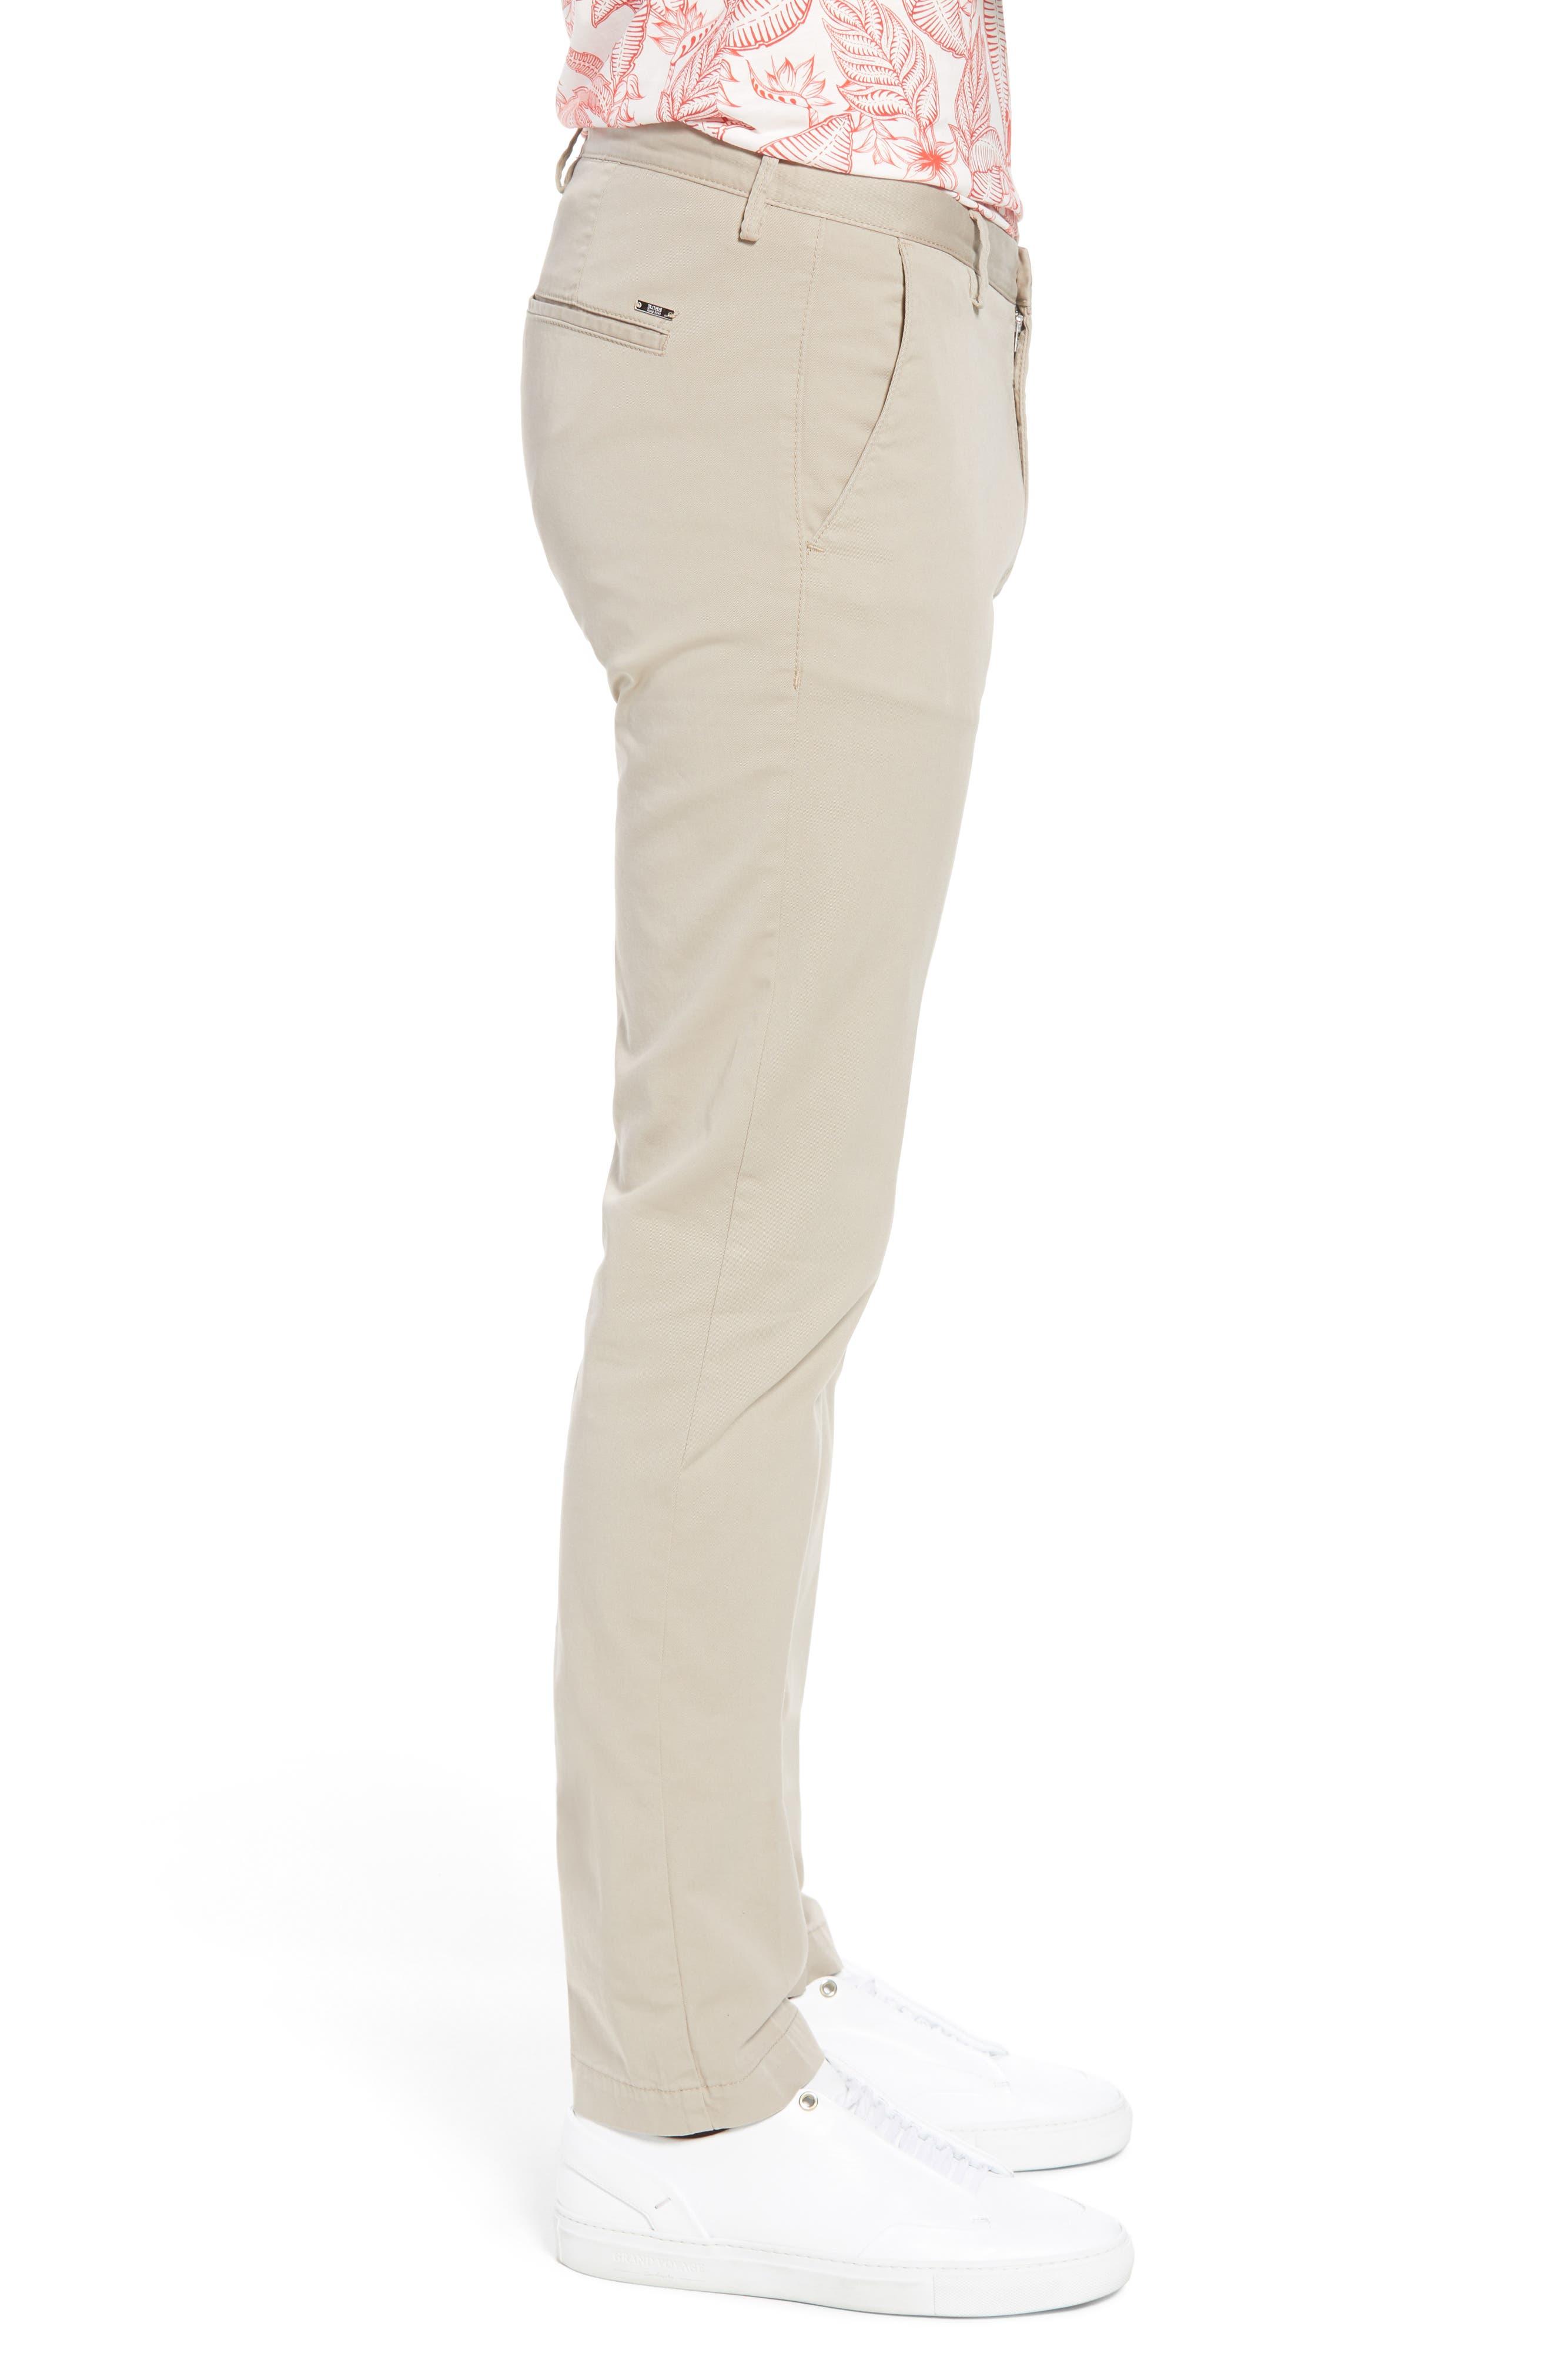 Rice Slim Fit Chino Pants,                             Alternate thumbnail 3, color,                             200